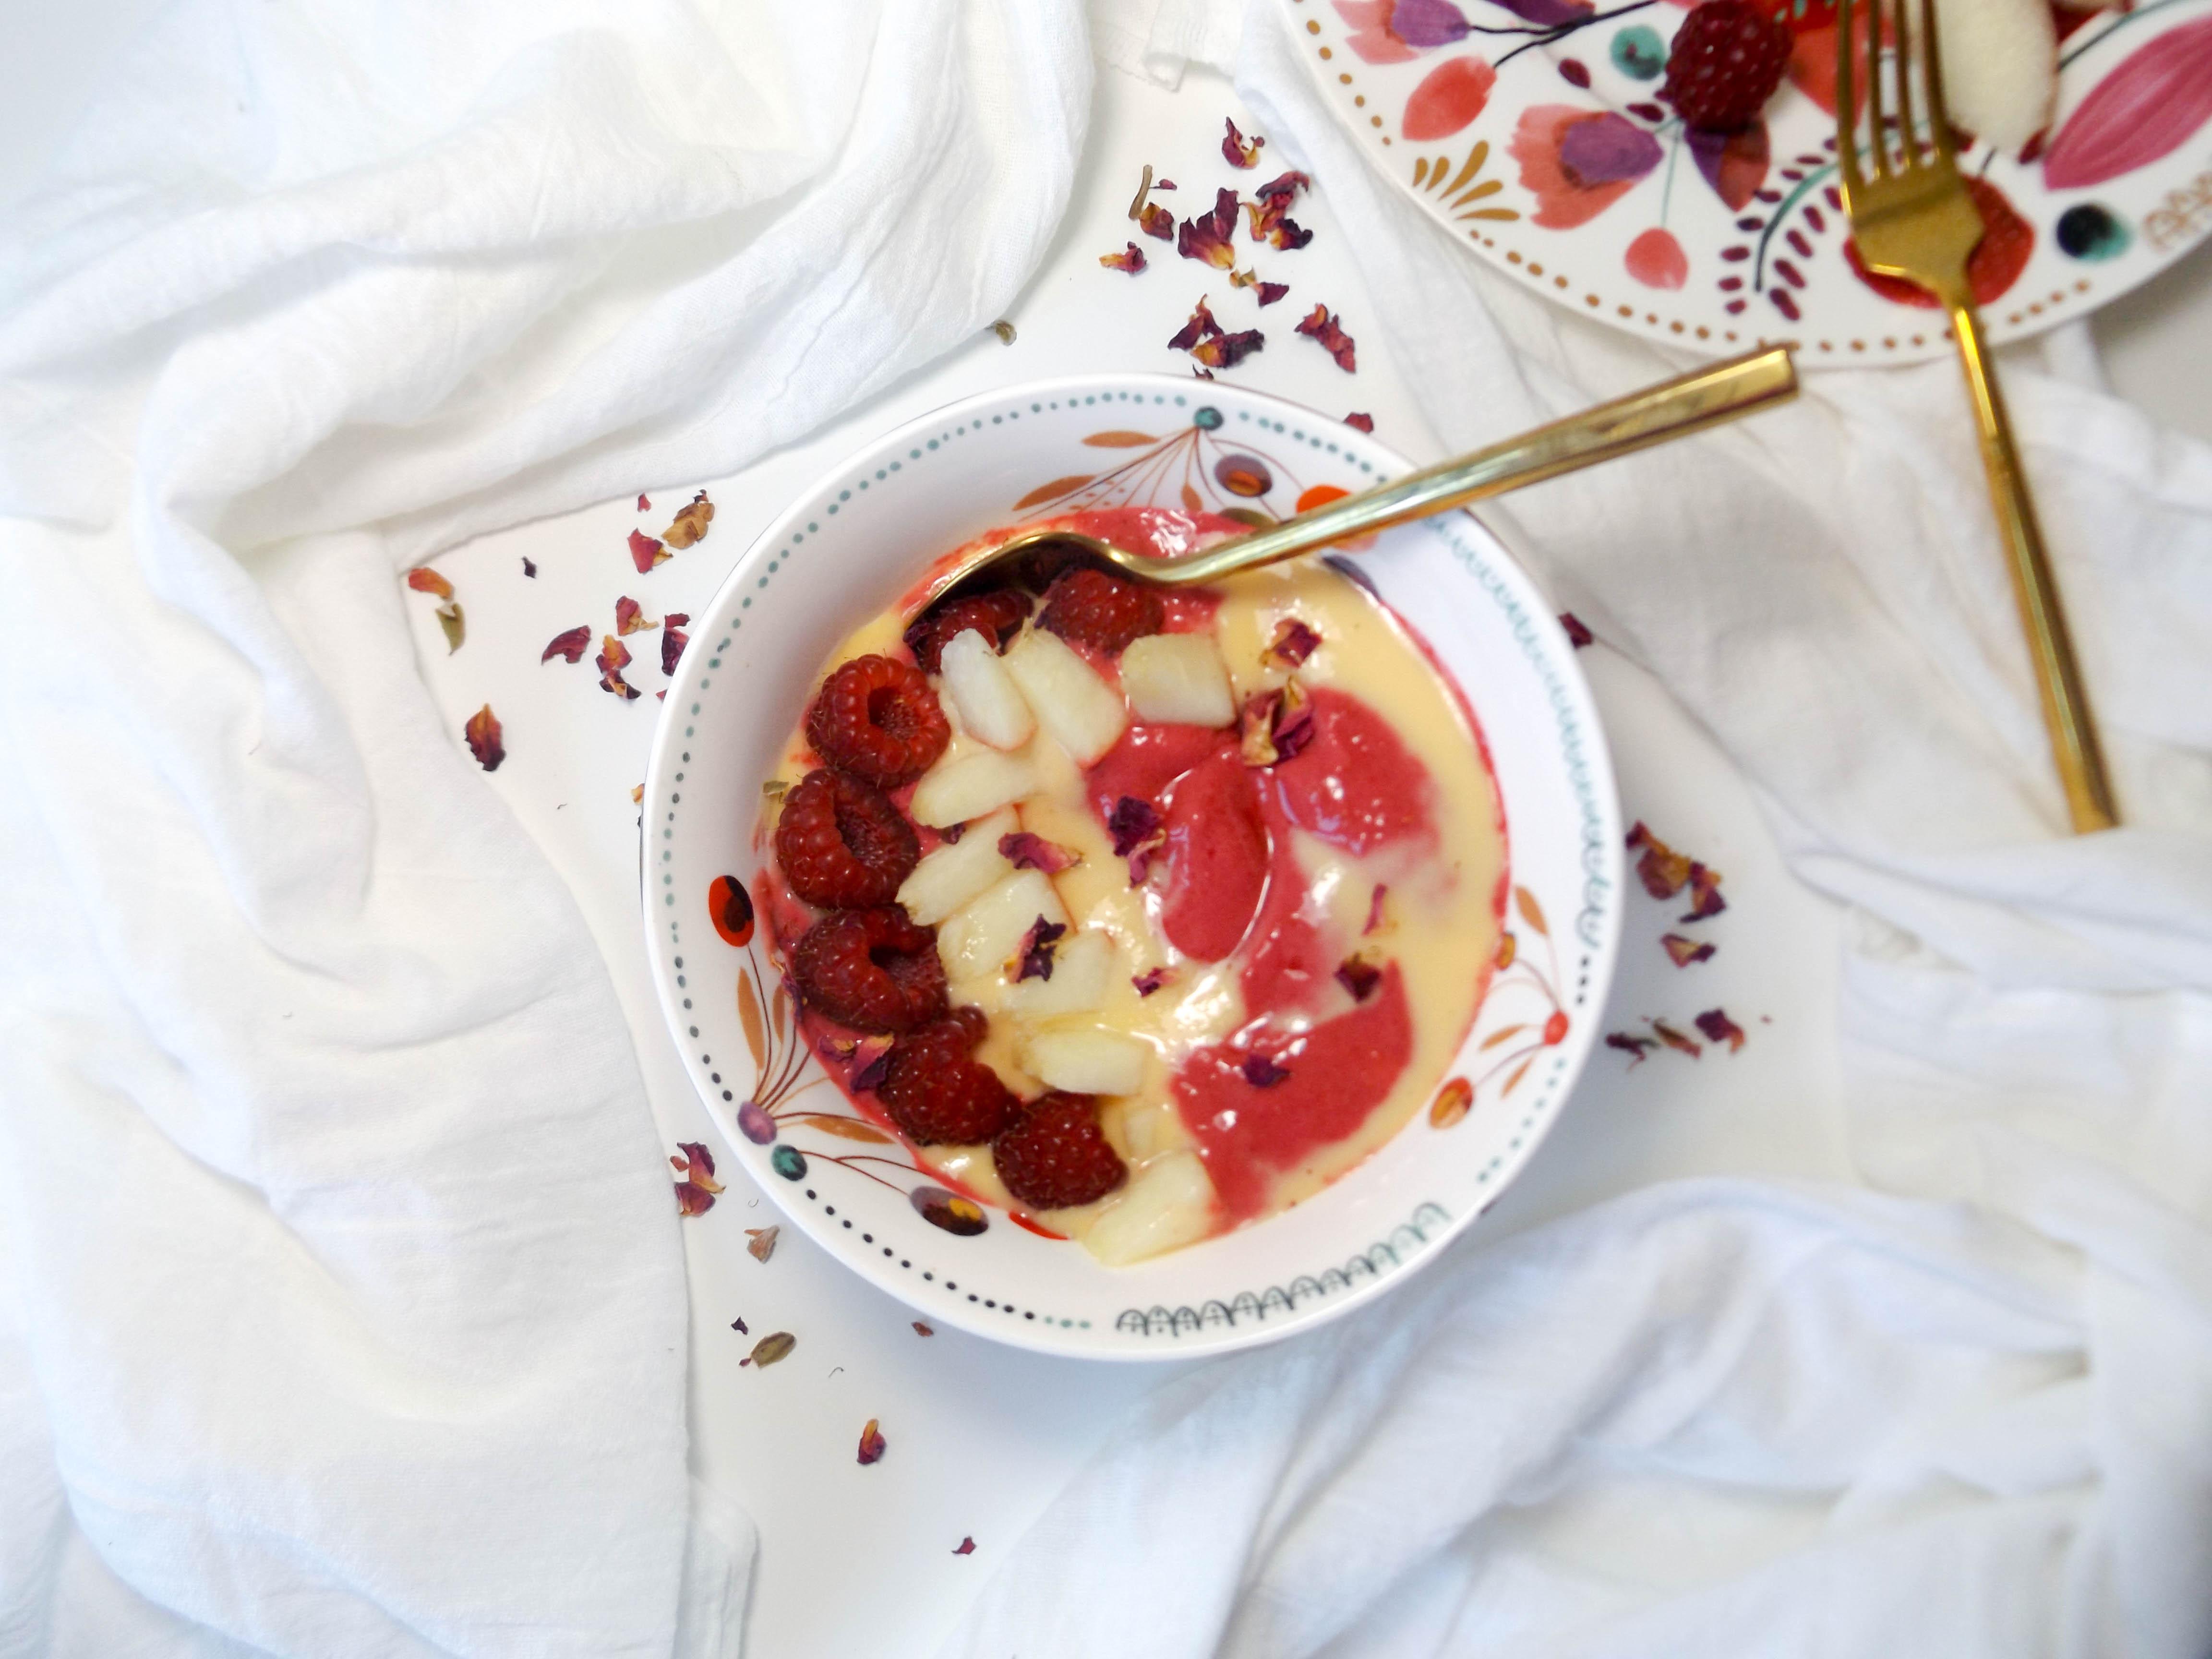 Peach Raspberry Swirl Smoothie